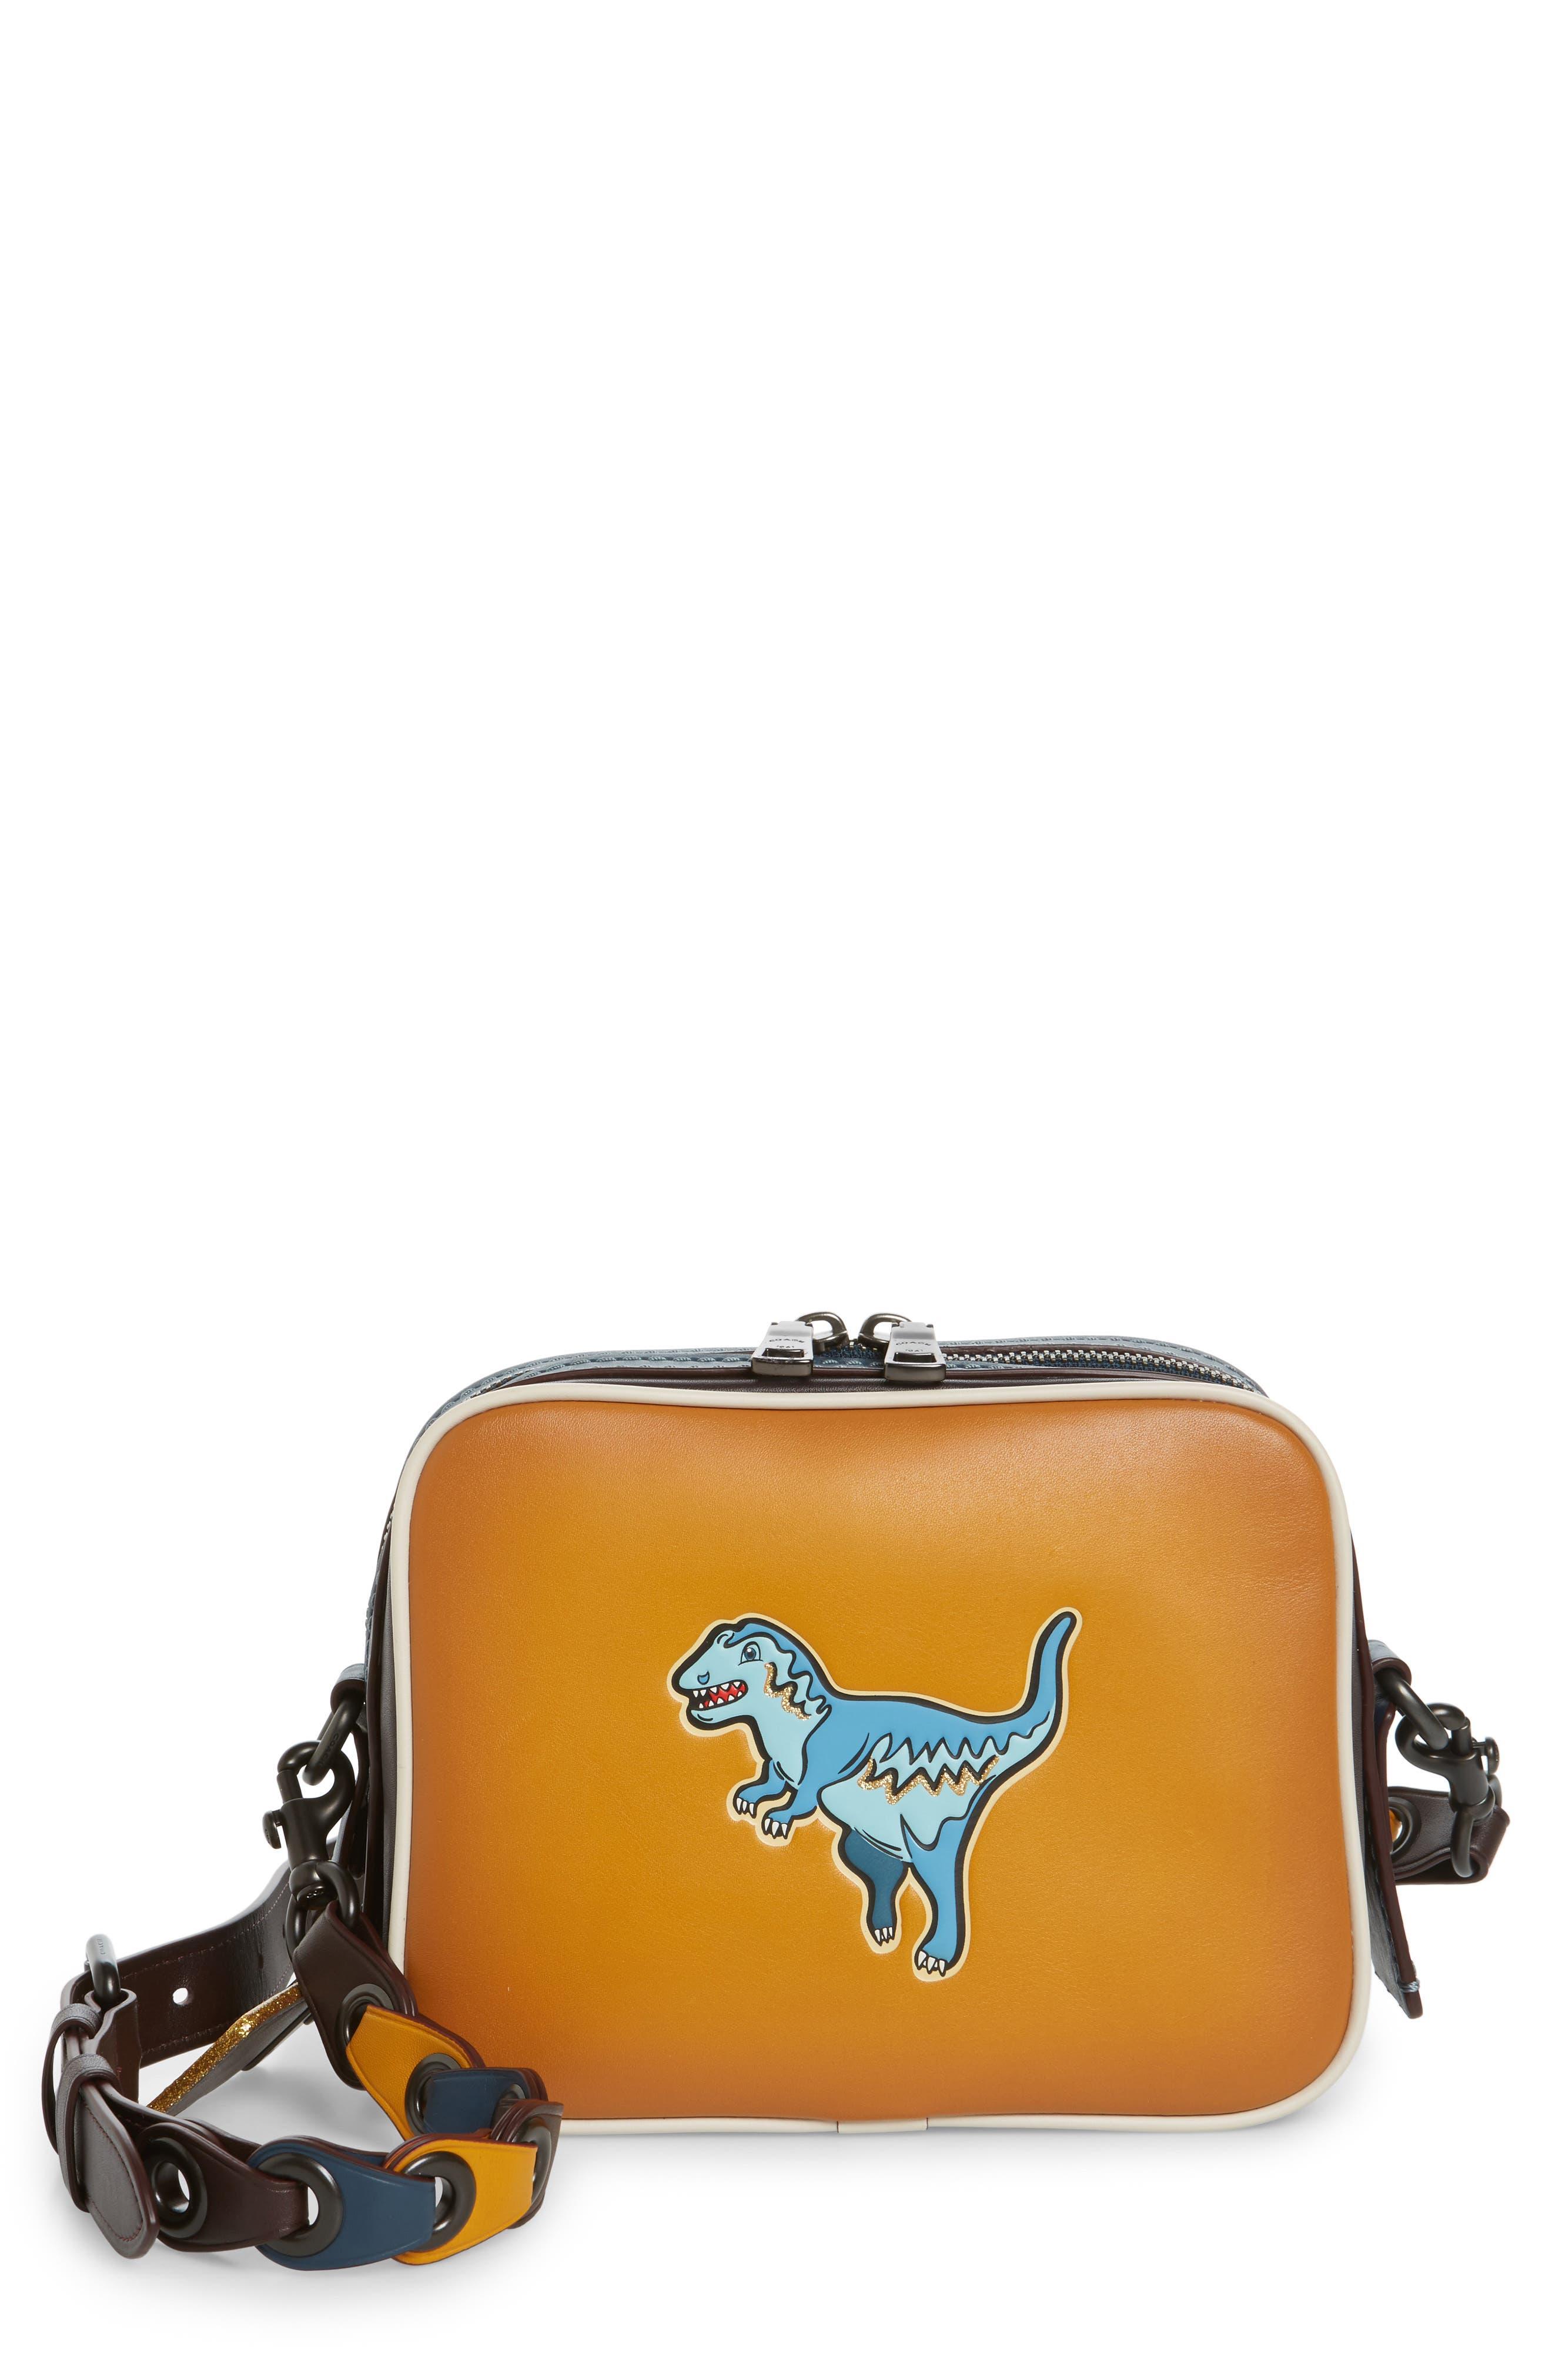 Rexy Leather Crossbody Bag,                             Main thumbnail 1, color,                             720